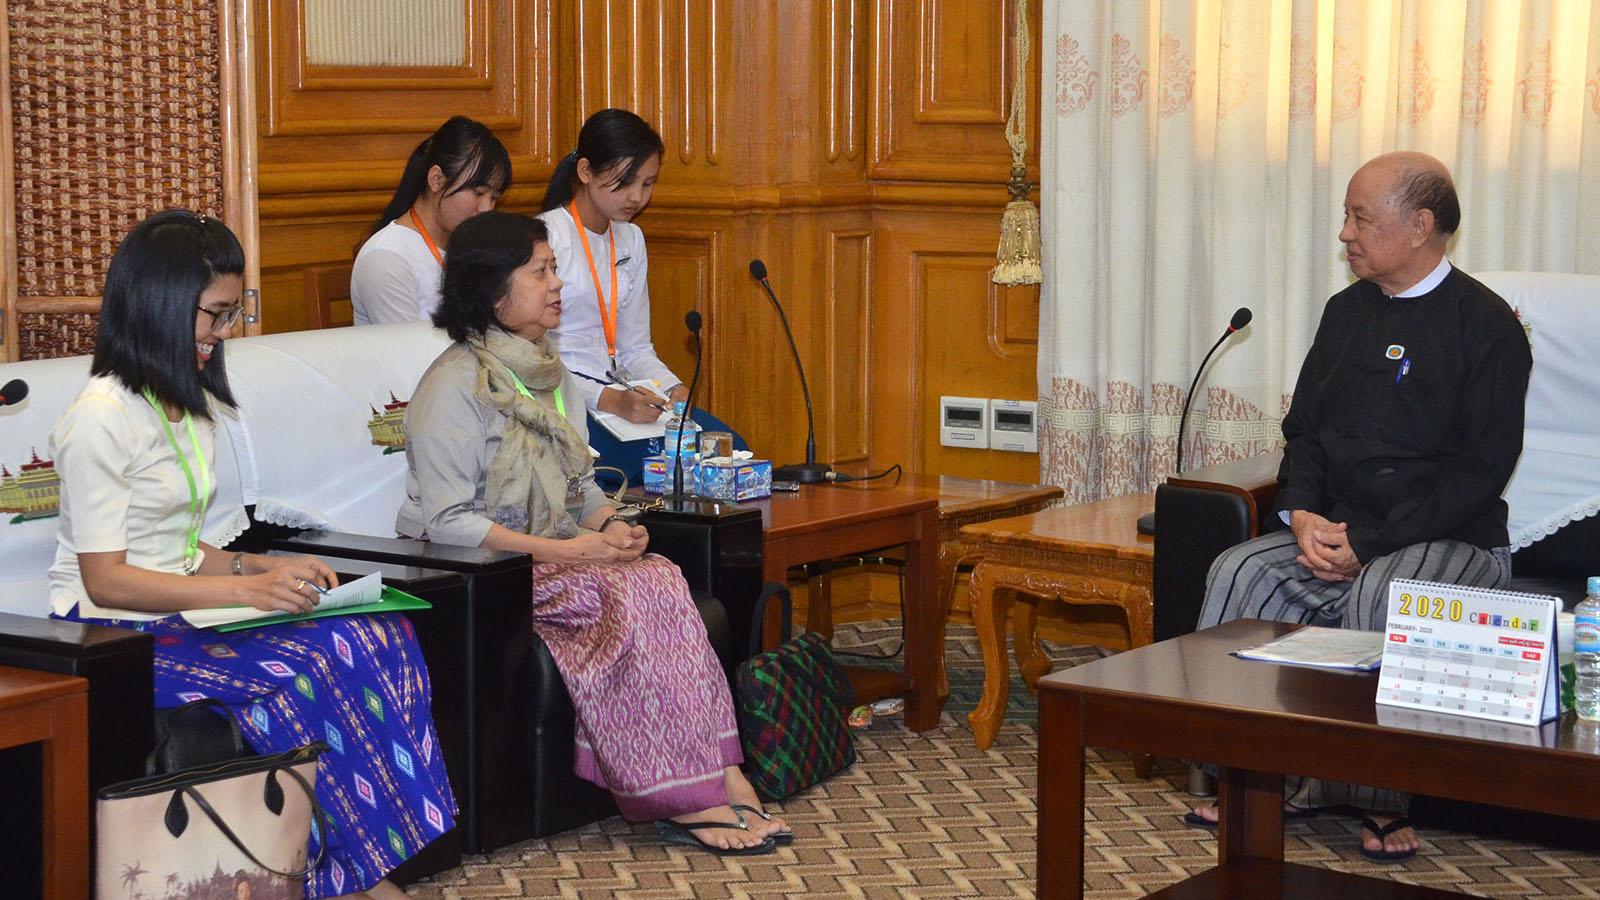 Pyithu Hluttaw Deputy Speaker U Tun Tun Hein meets with Managing Director of the Bower Group Asia (Myanmar) Daw Tin May Thein (Judy Ko) in Nay Pyi Taw yesterday.Photo: MNA